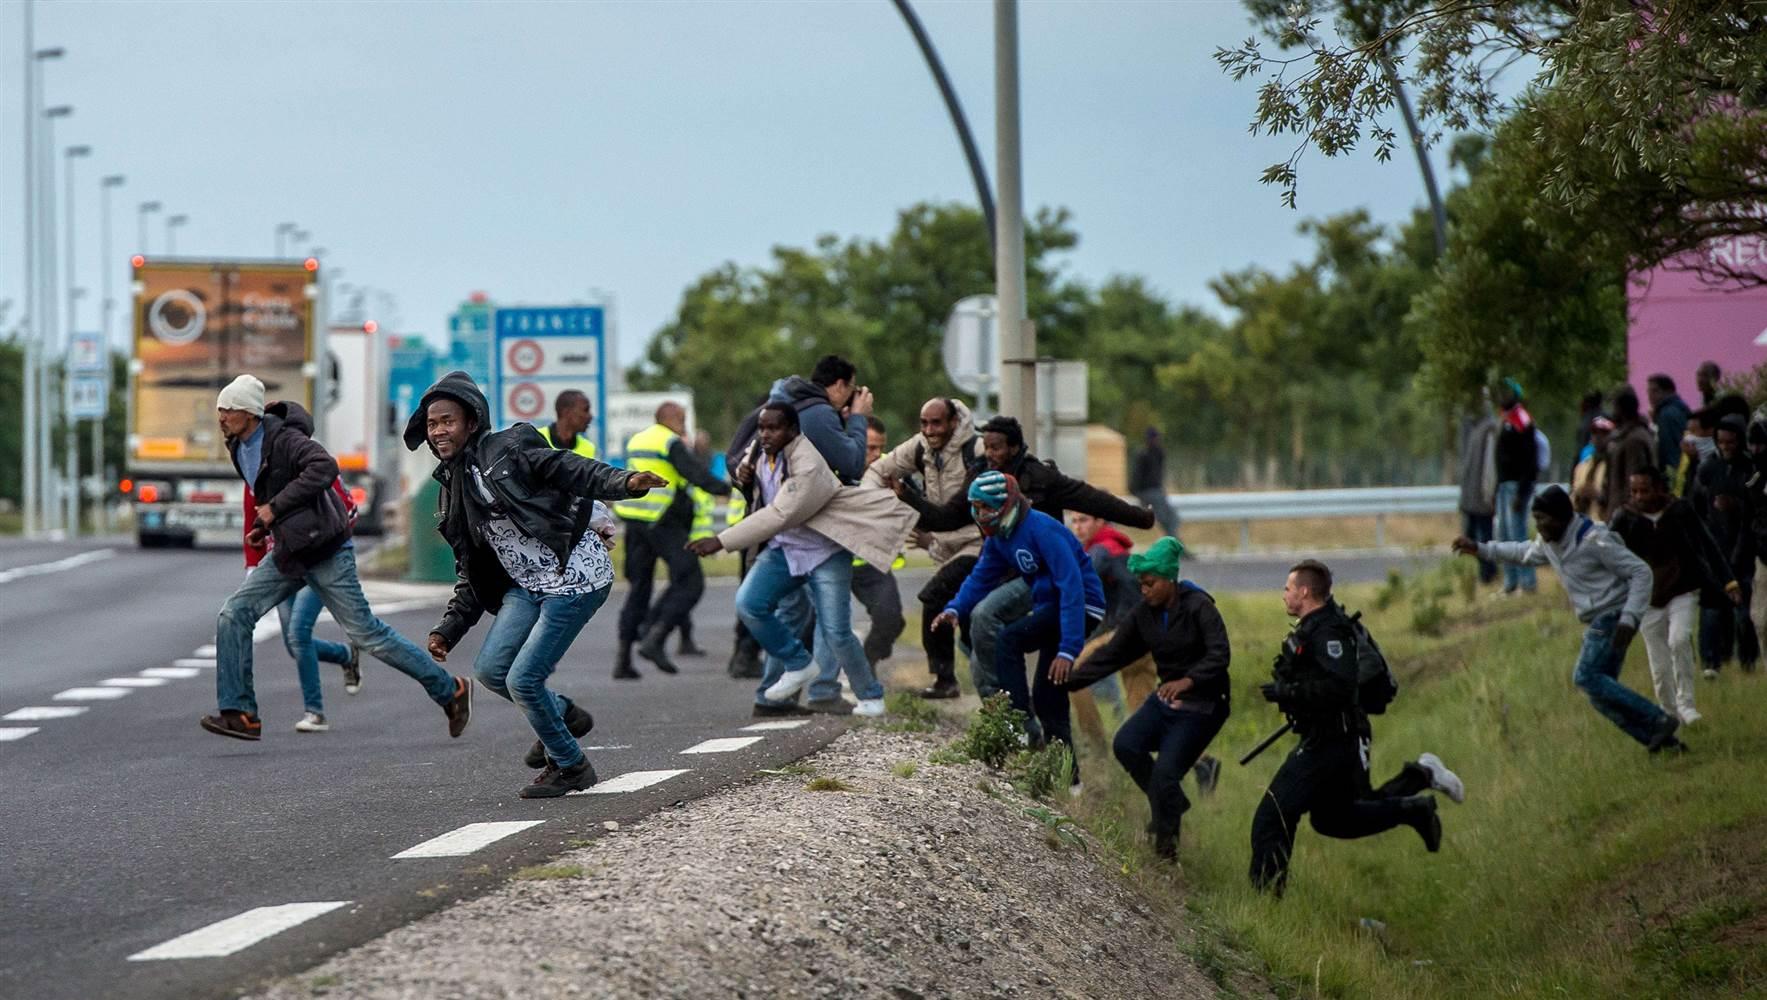 150730-calais-france-migrants-jpo-354a_037afc764ae03acd7725deac492d619e.nbcnews-ux-2880-1000